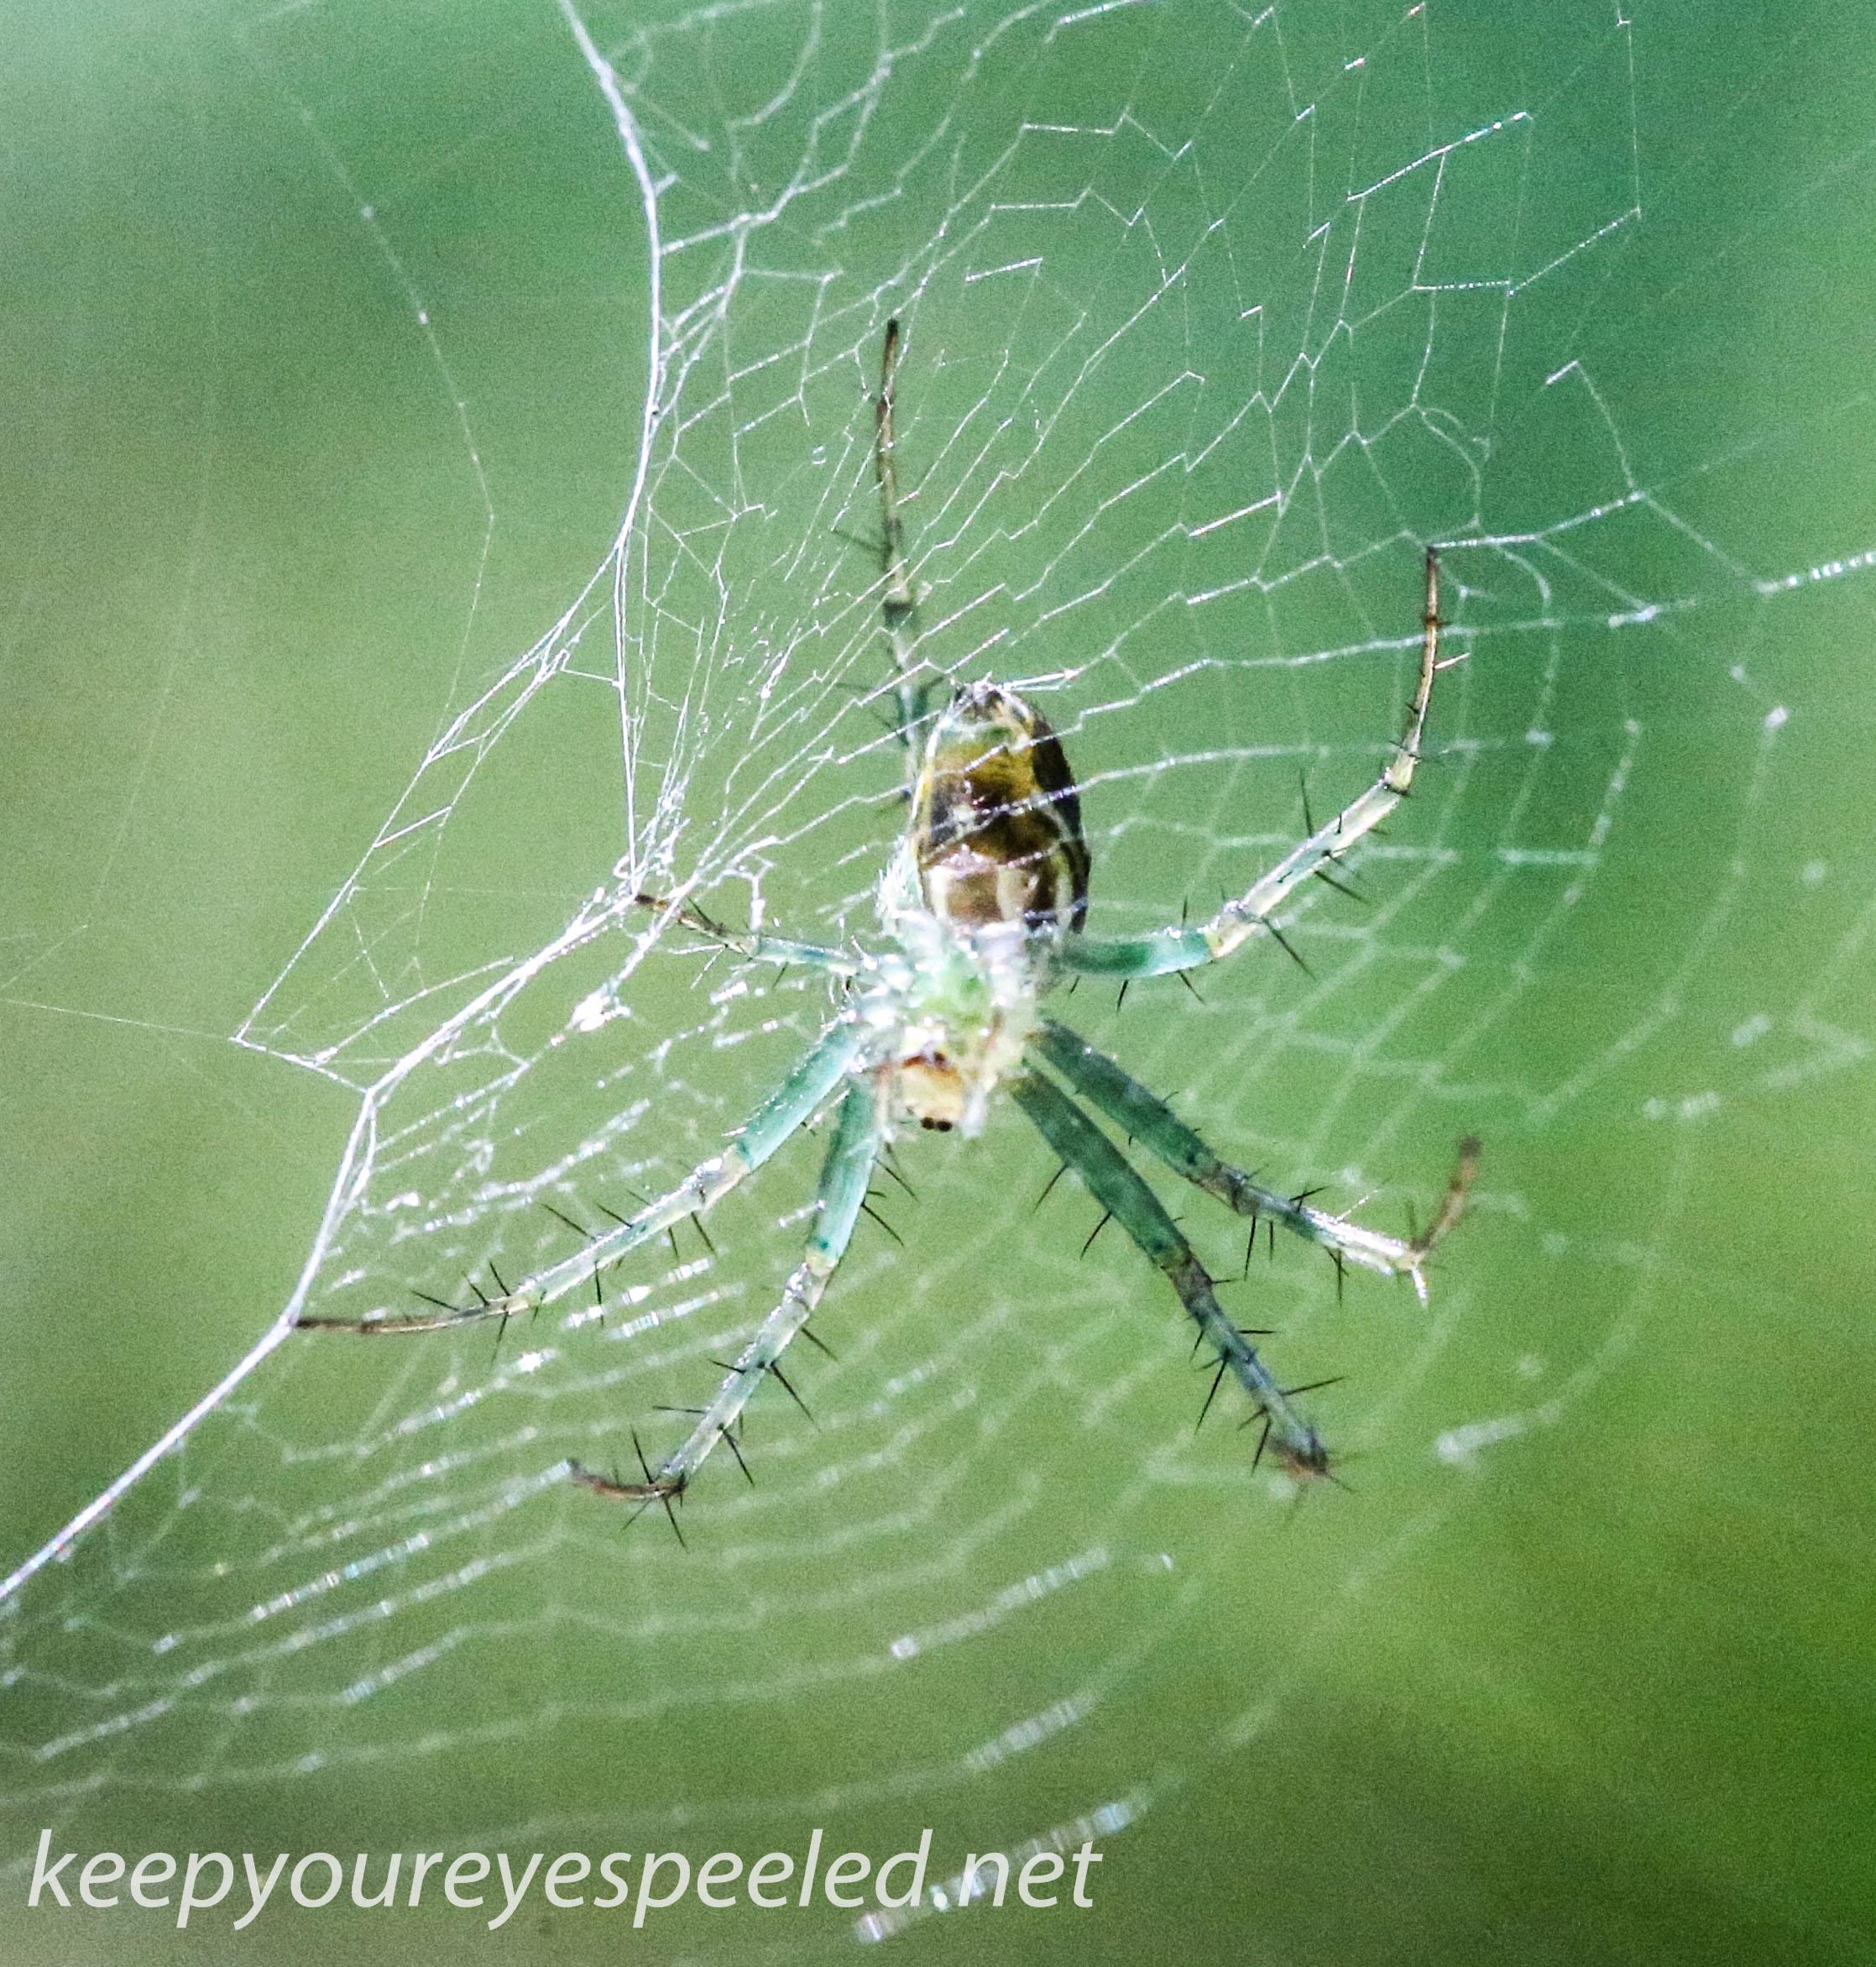 PPL Wetlands spider 30 (1 of 1).jpg